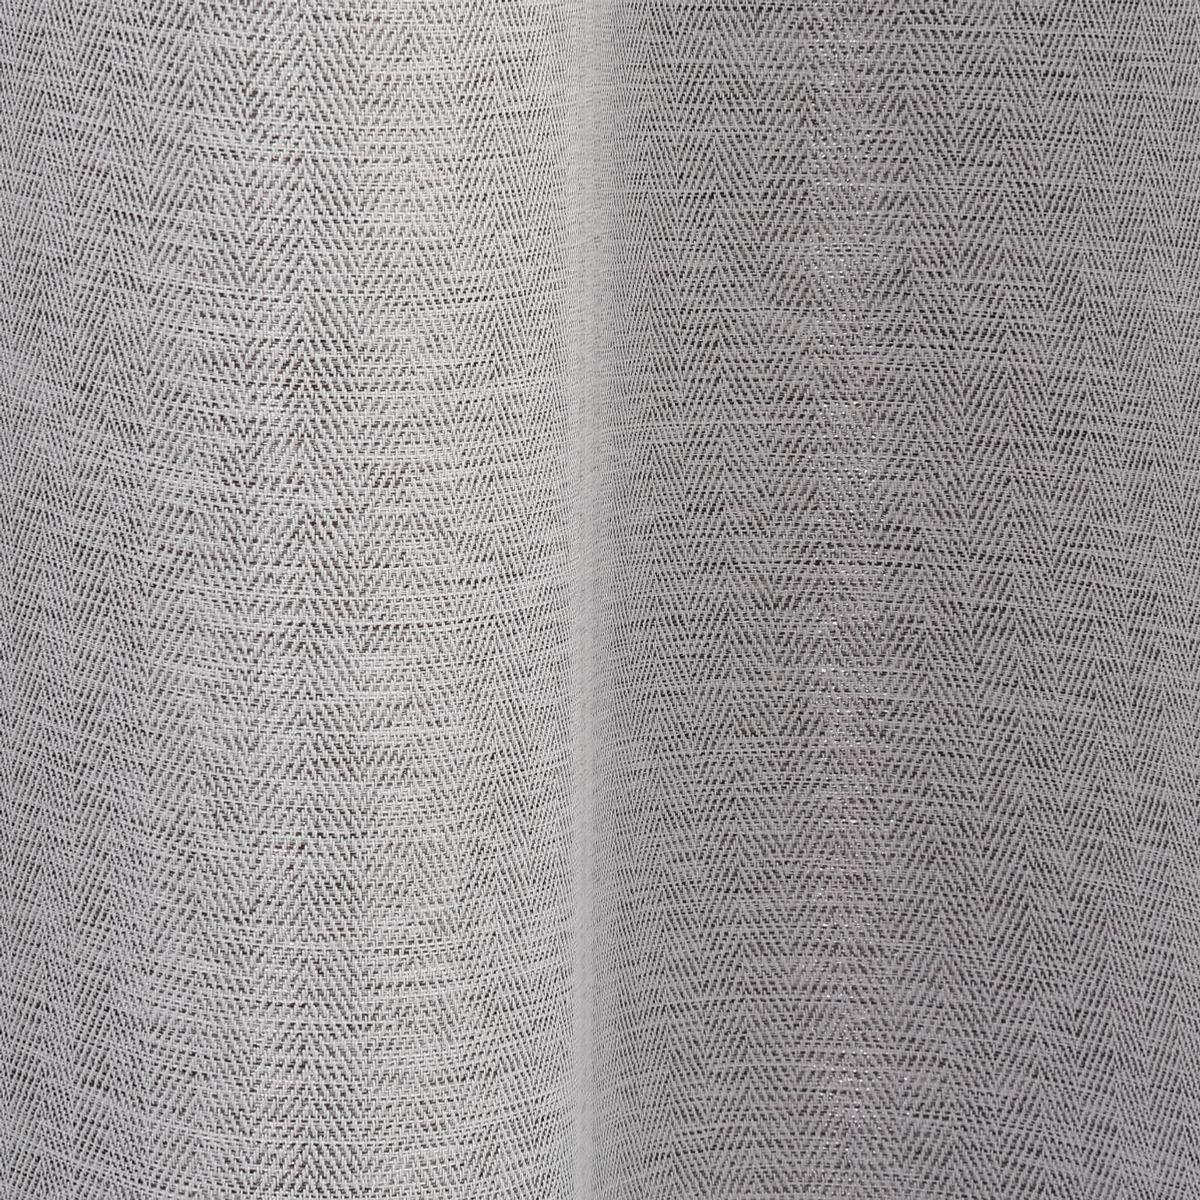 Rideau occultant gris moyen Pichima 140x260 cm